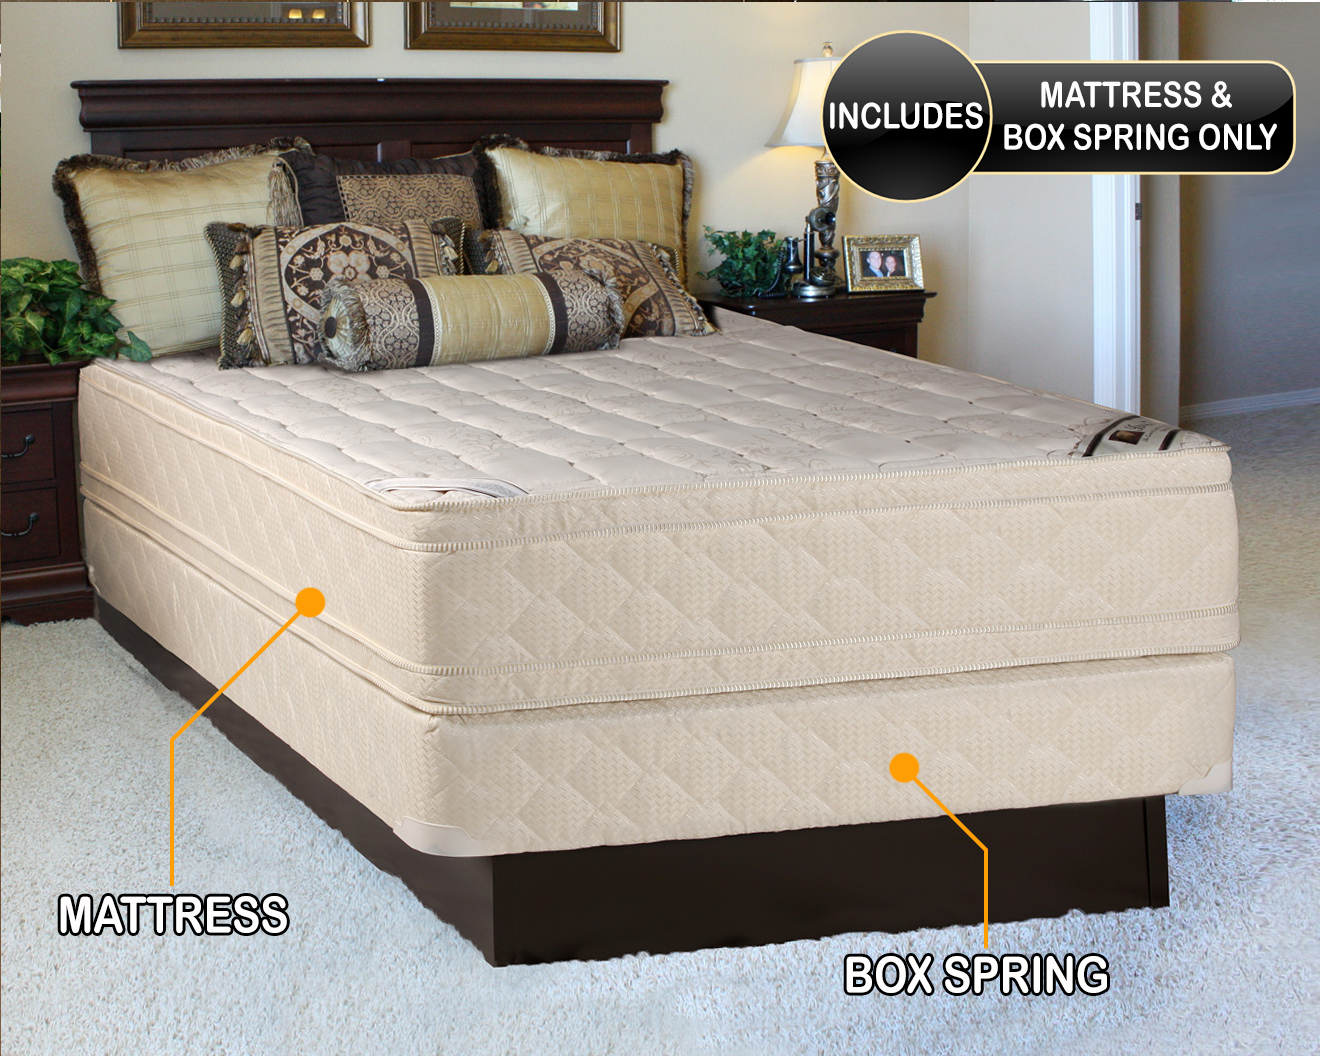 elite extrapedic pillow top king size mattress and box spring set